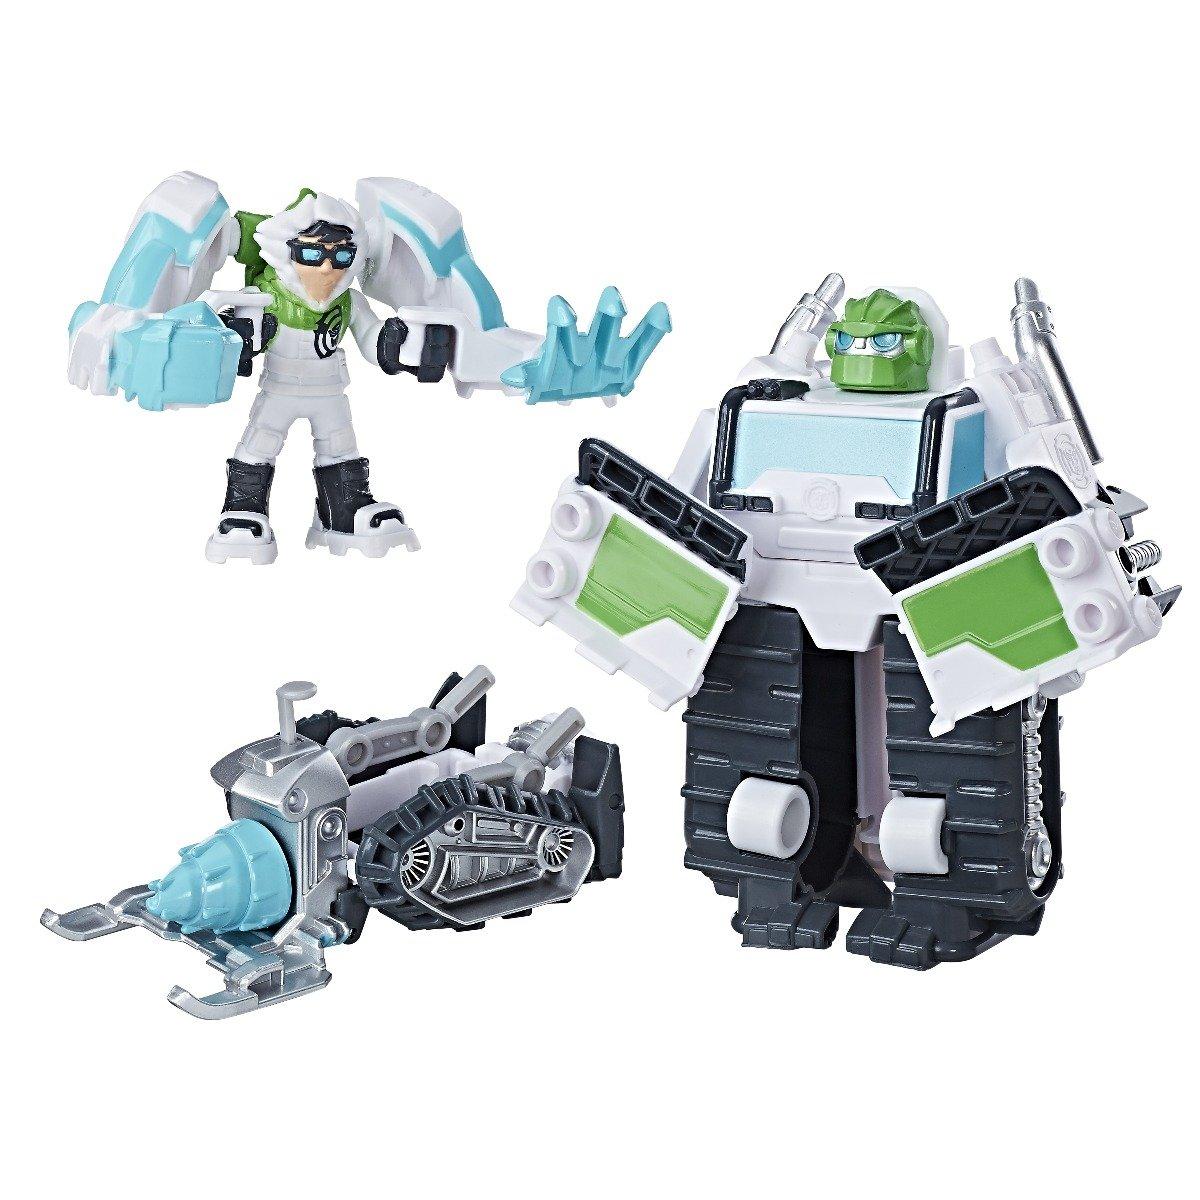 Set Transformers - Echipa de salvare a lui Bumblebee, Artic Rescue Boulder